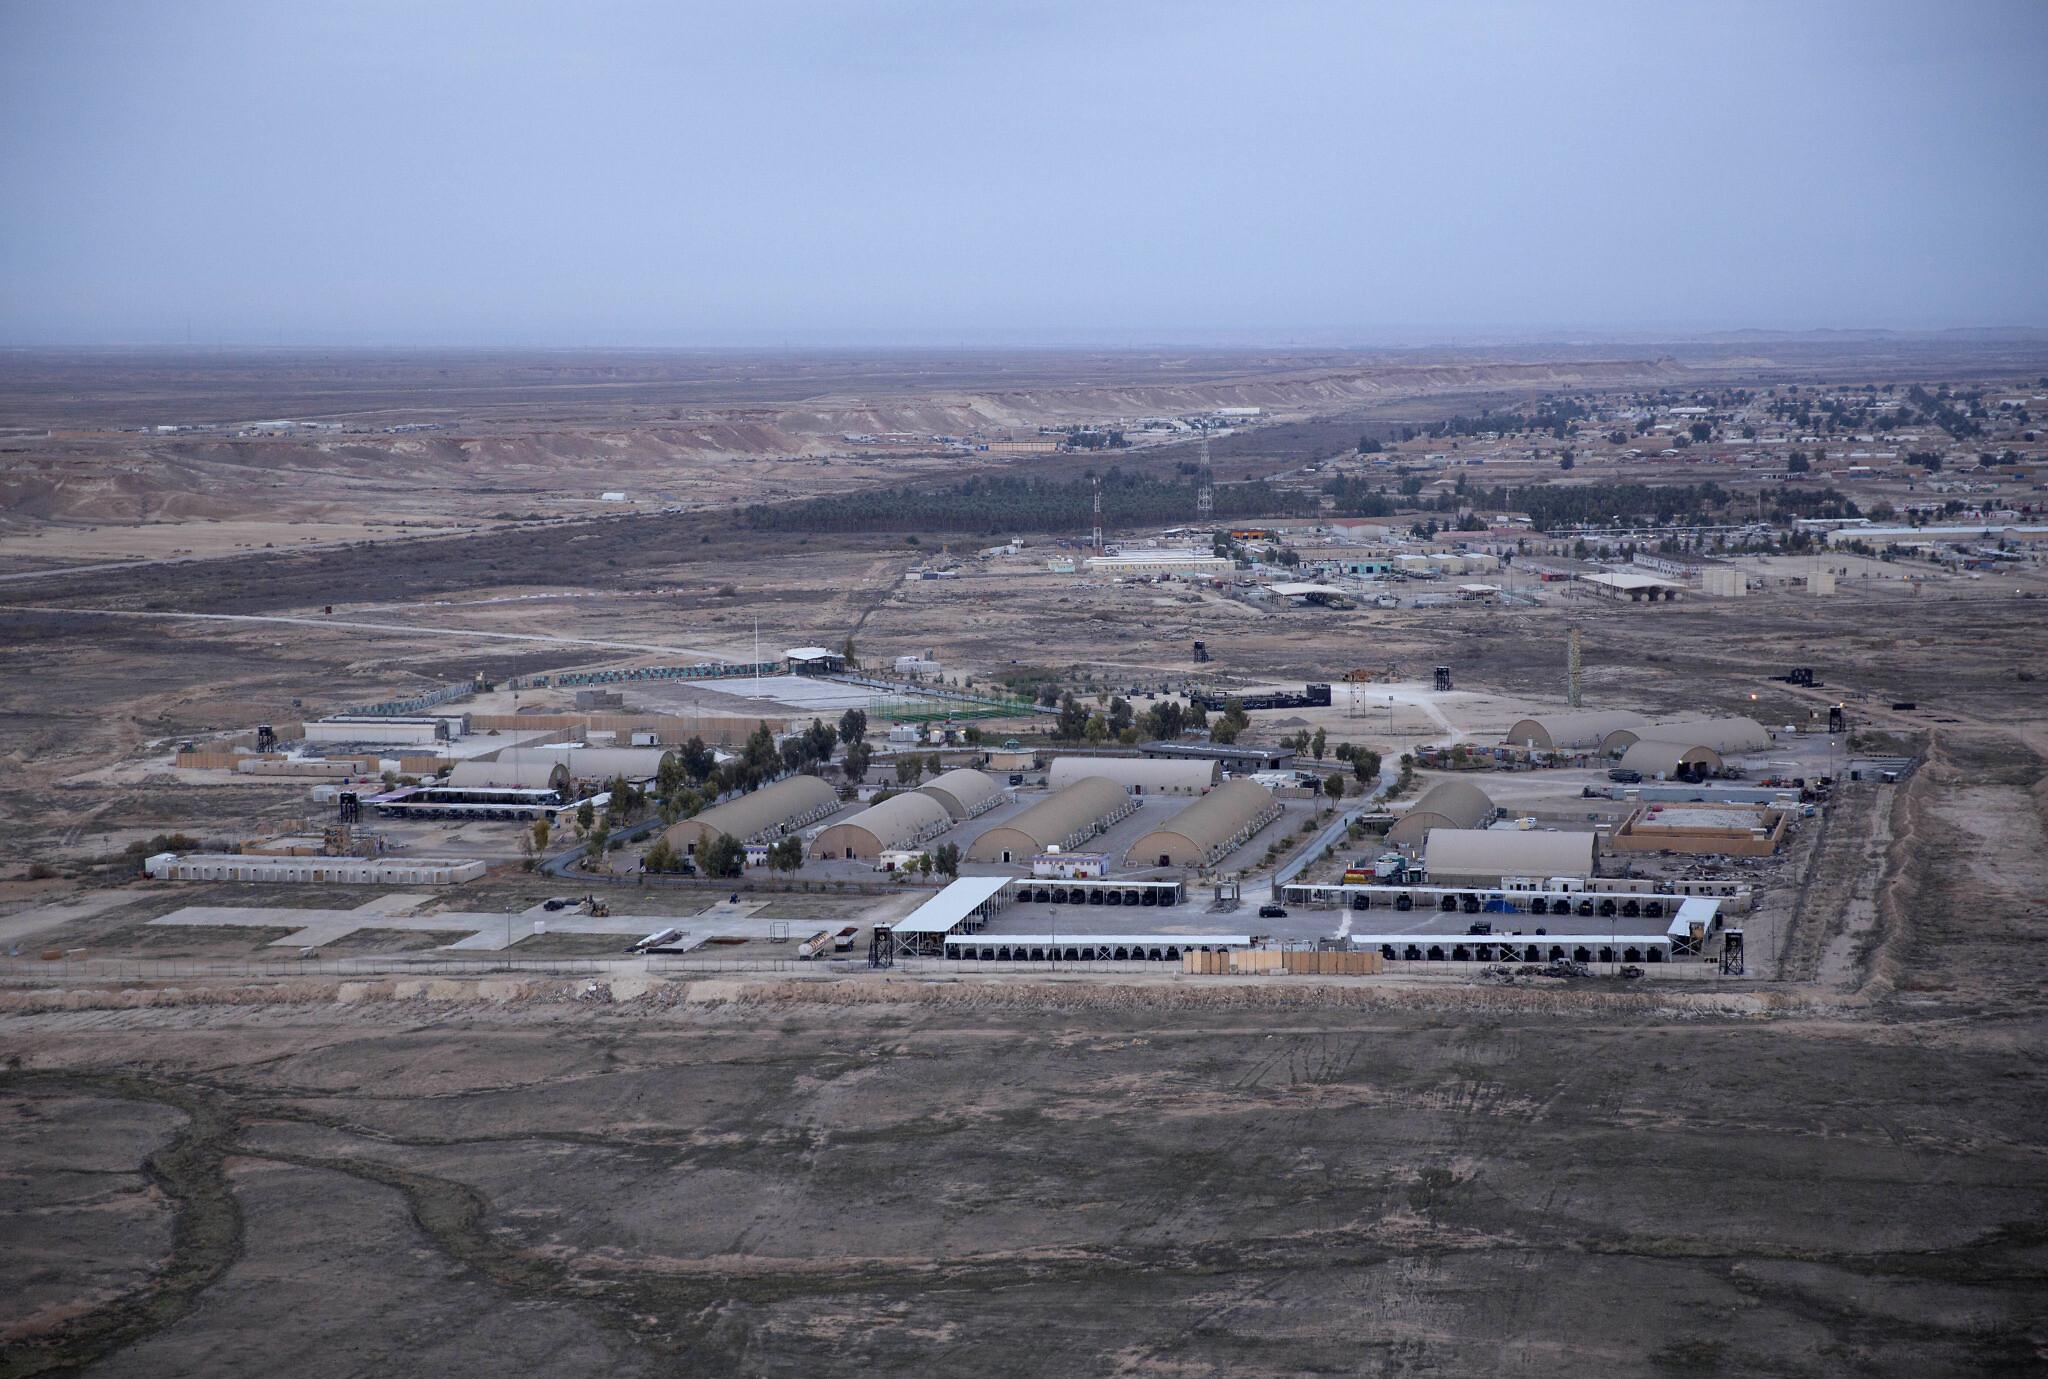 Iraqi Military Base Hosting U.S. Troops Targeted by Drone Strike